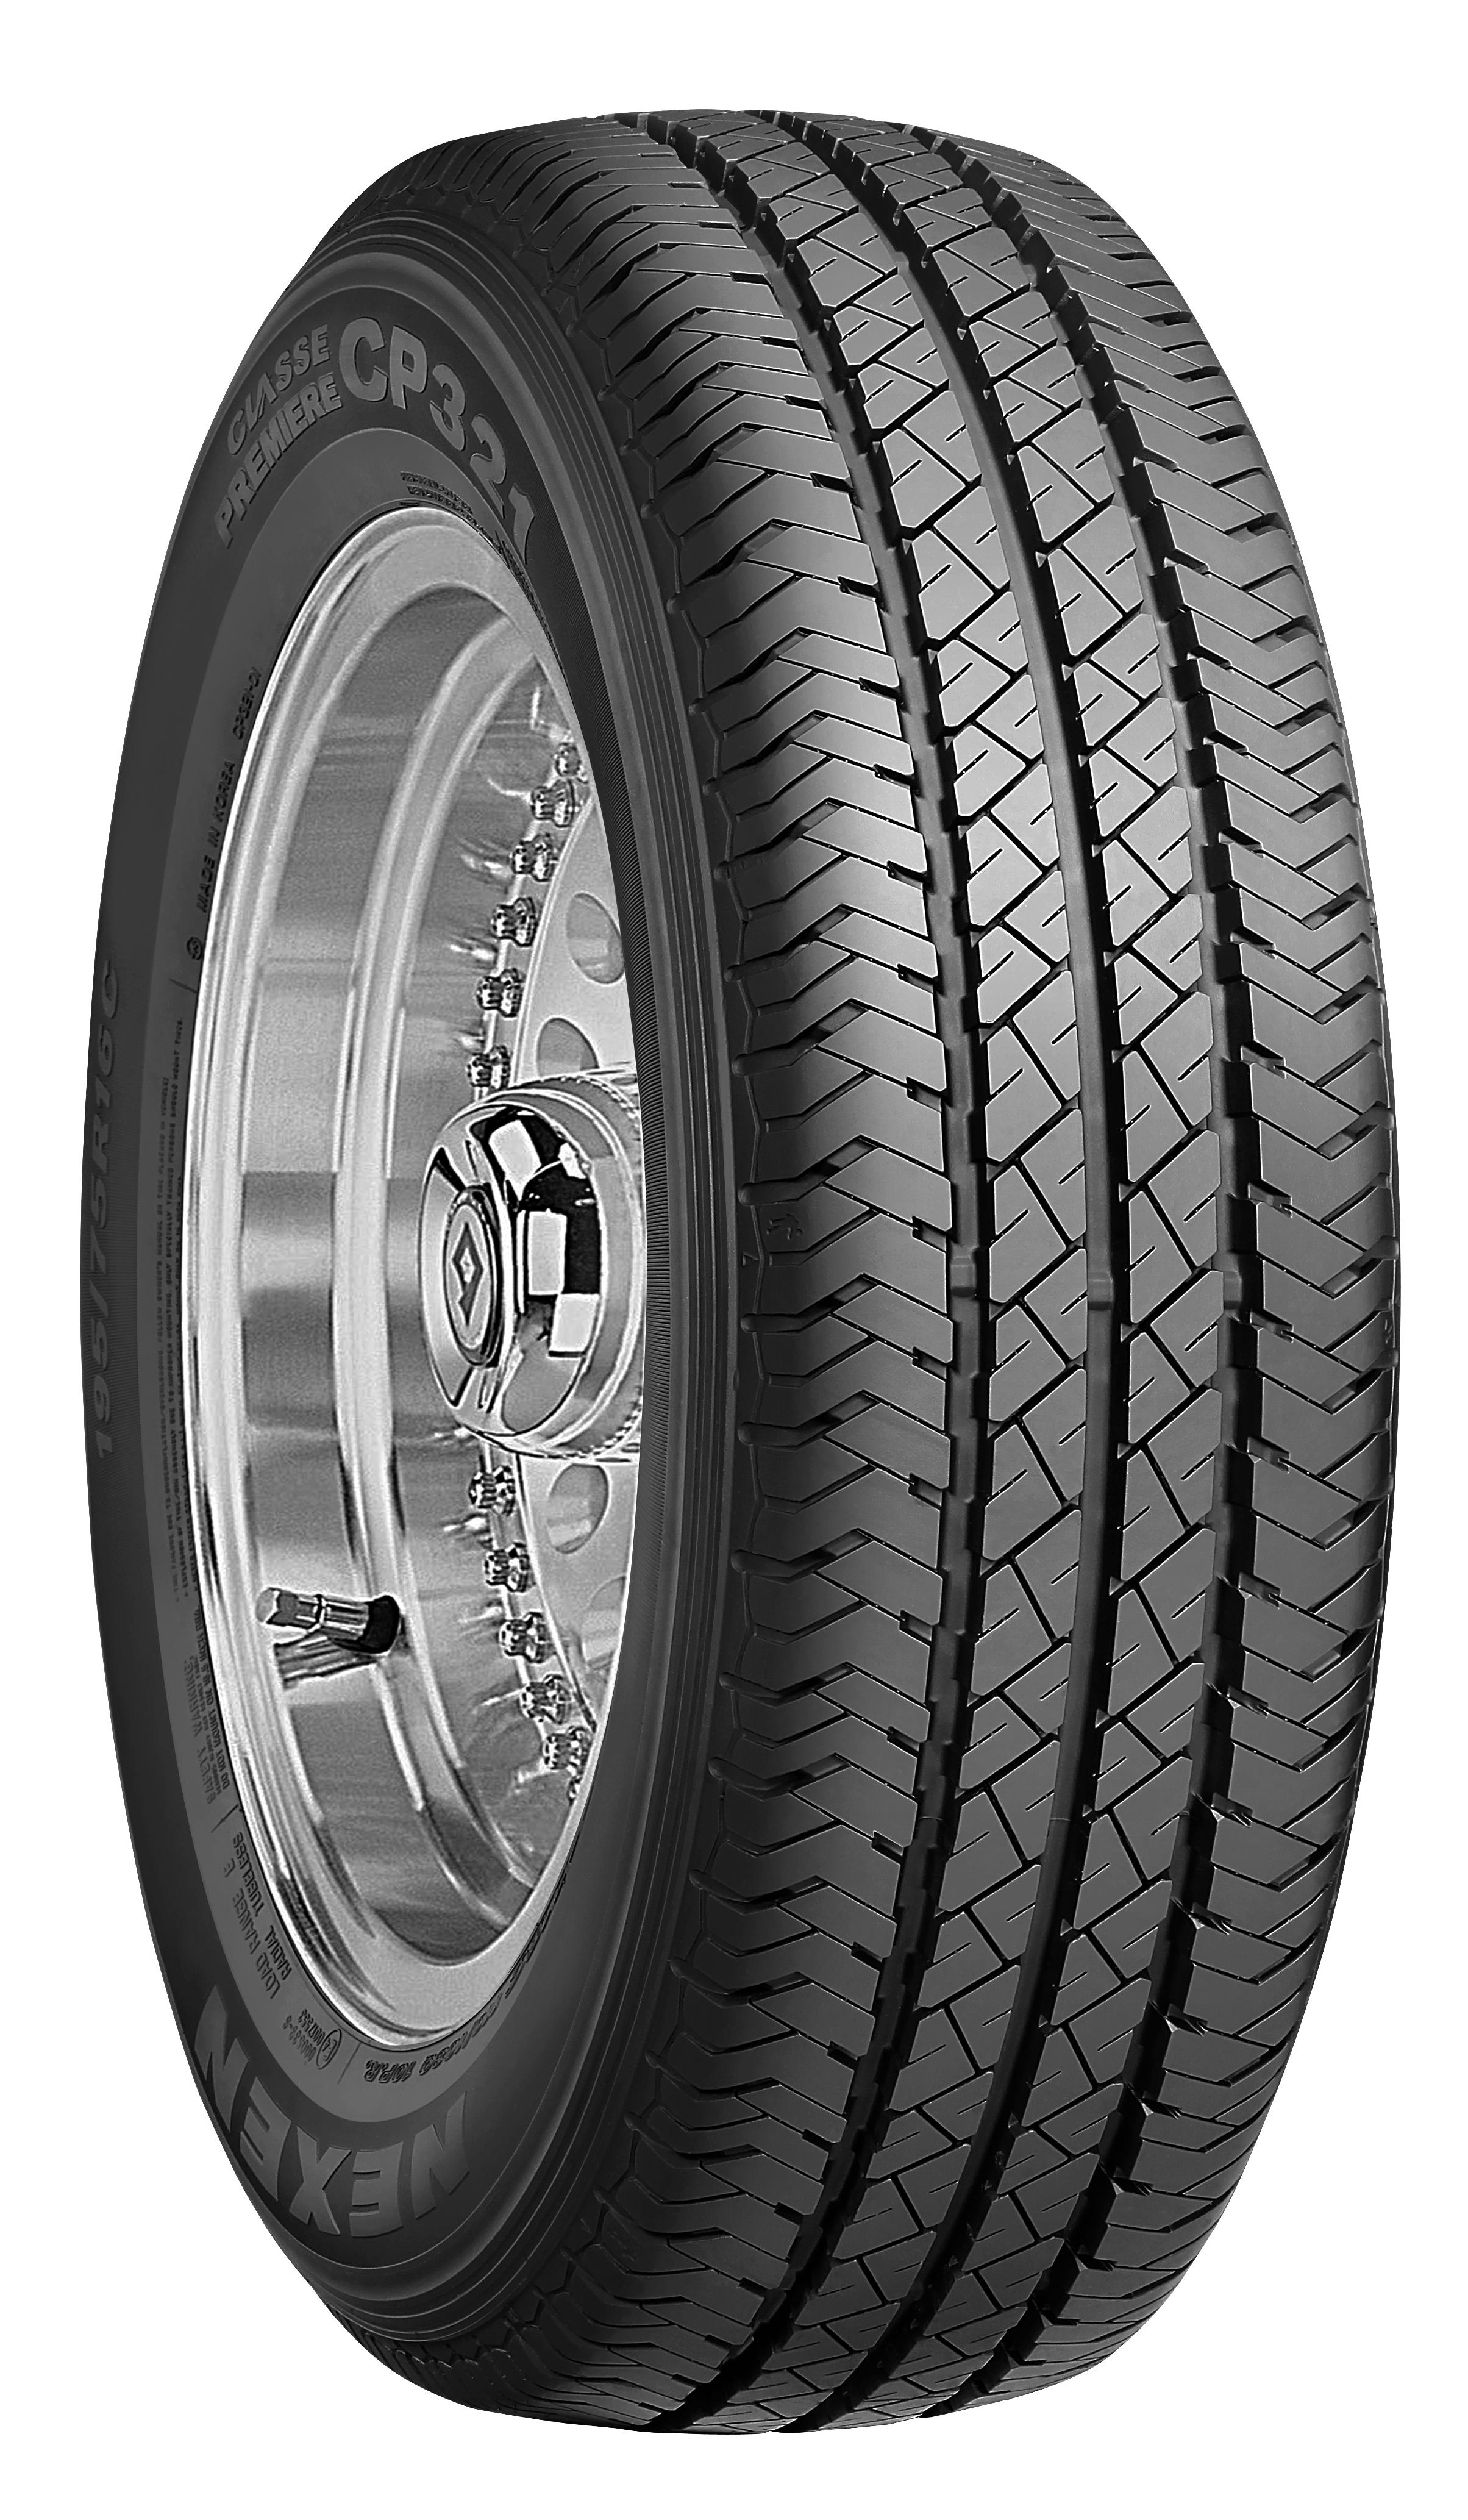 High marks for Nexen summer tires in Germany